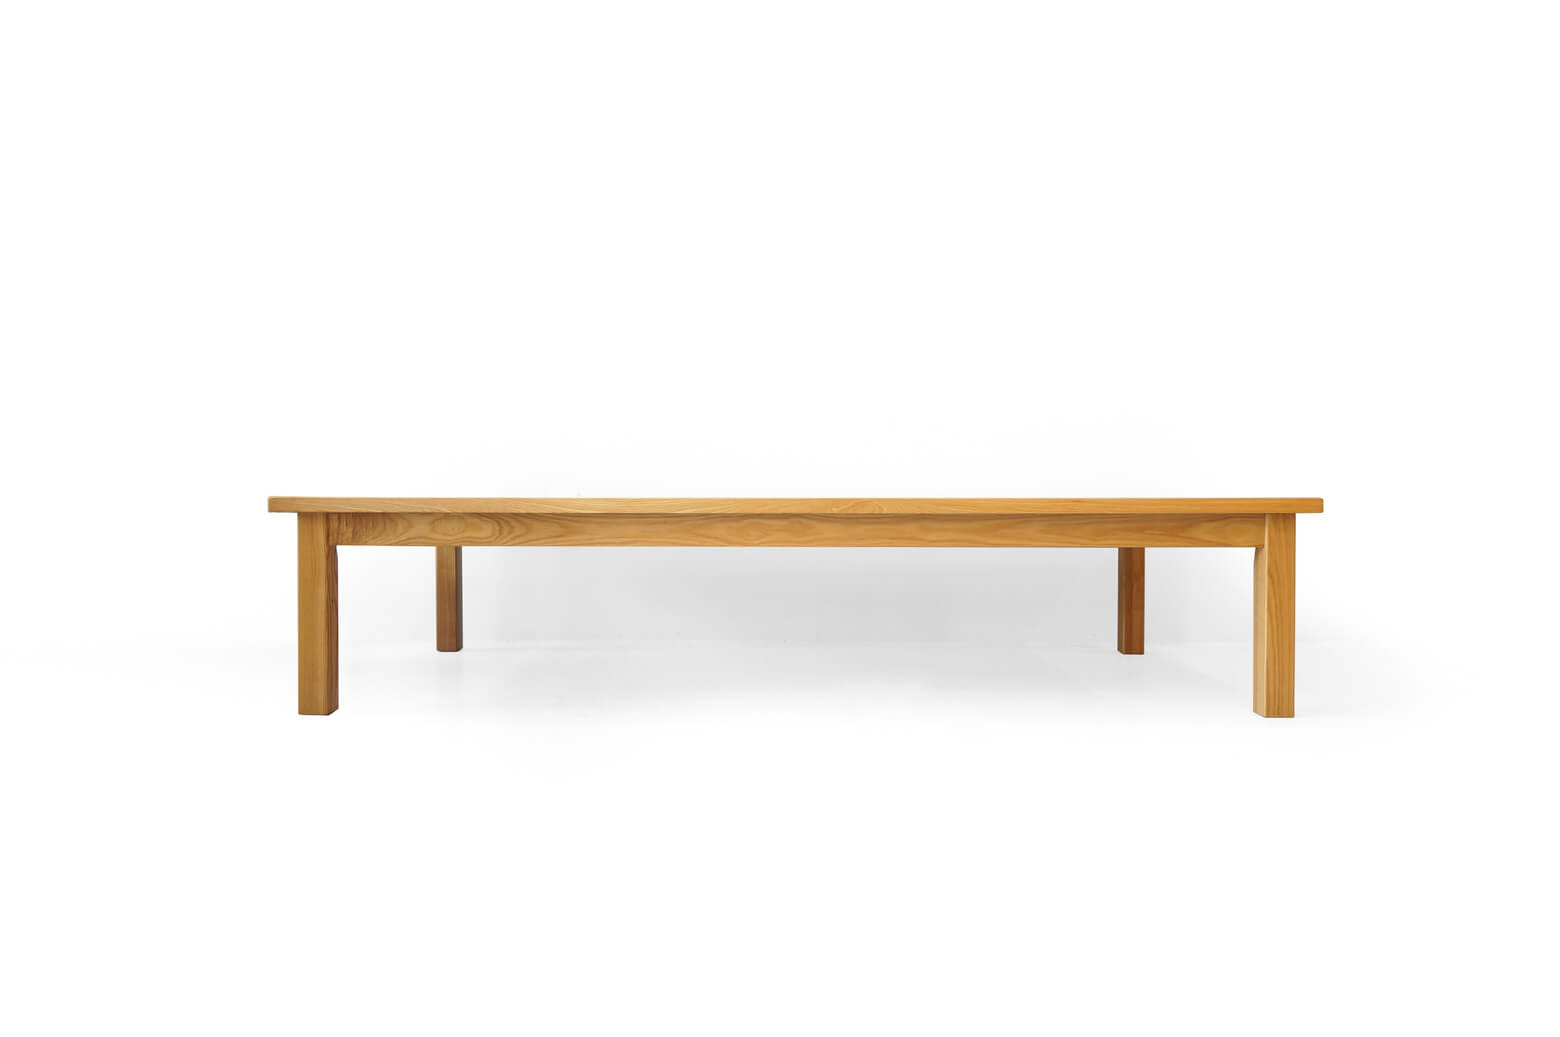 MUJI Low Table Ash Wood/無印良品 ローテーブル 座卓 タモ材 ナチュラル シンプル 廃盤